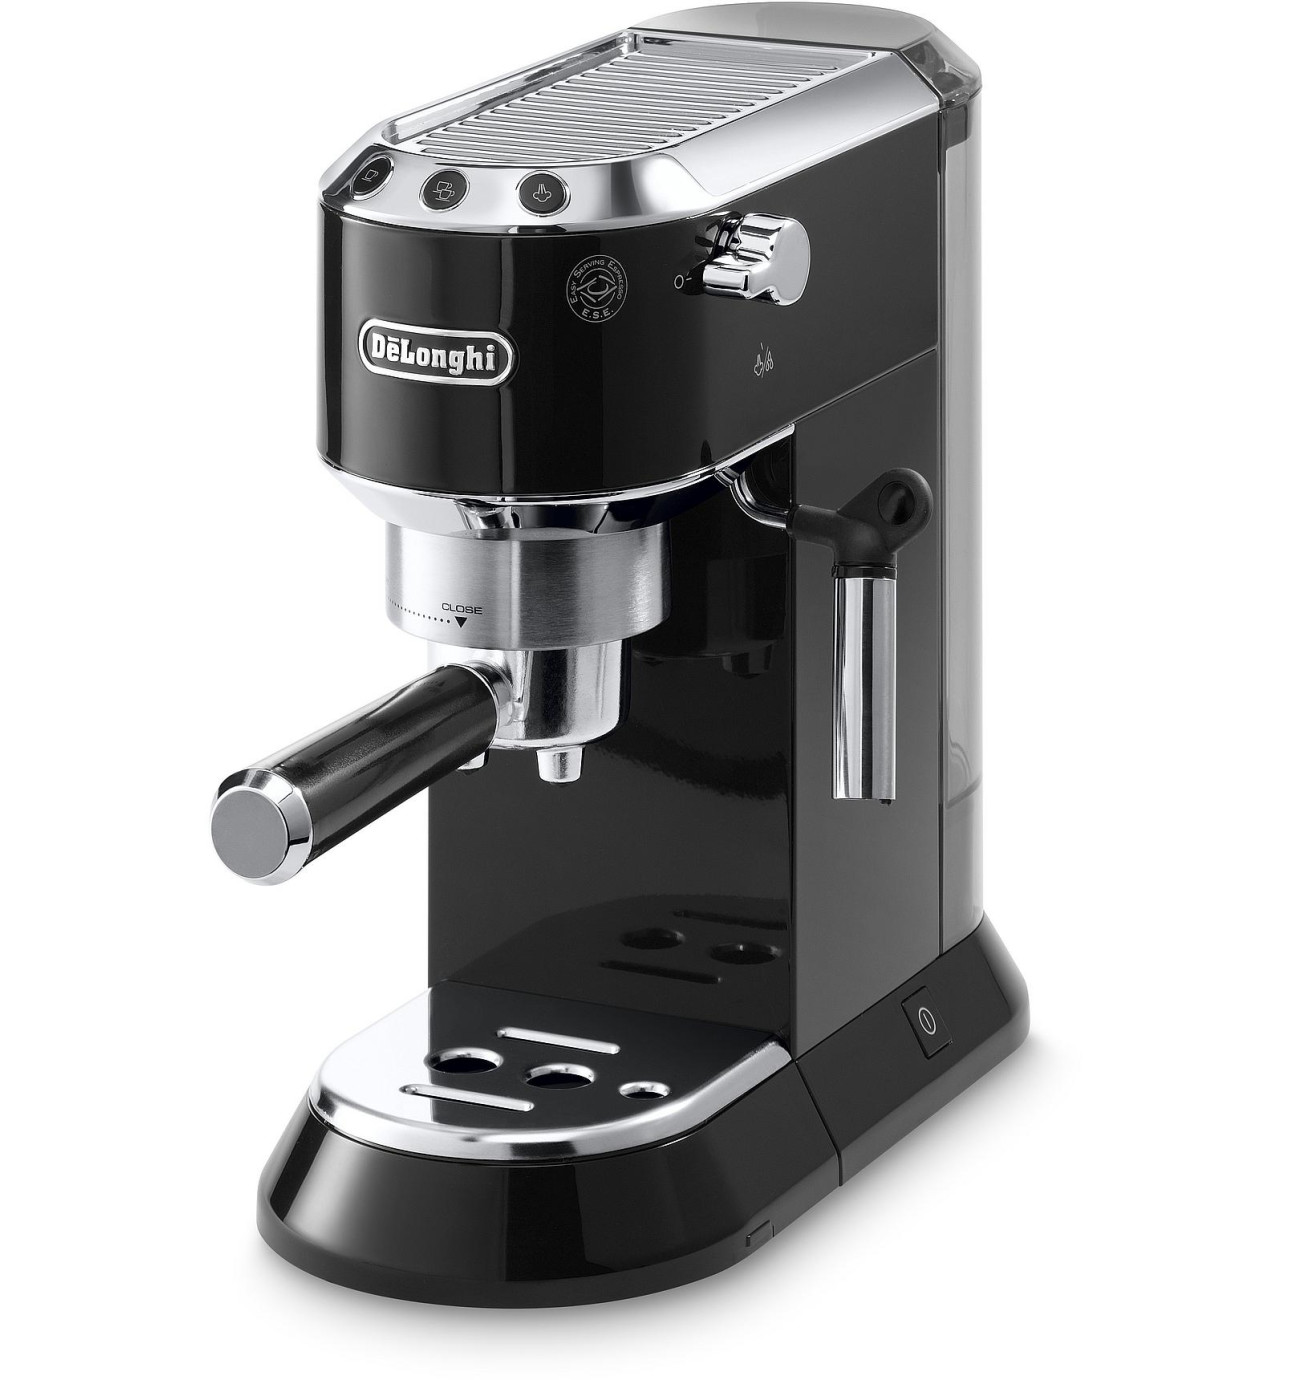 Electronic David Jones Coffee Machines david jones coffee machines grinders delonghi ec680bk dedica machine black